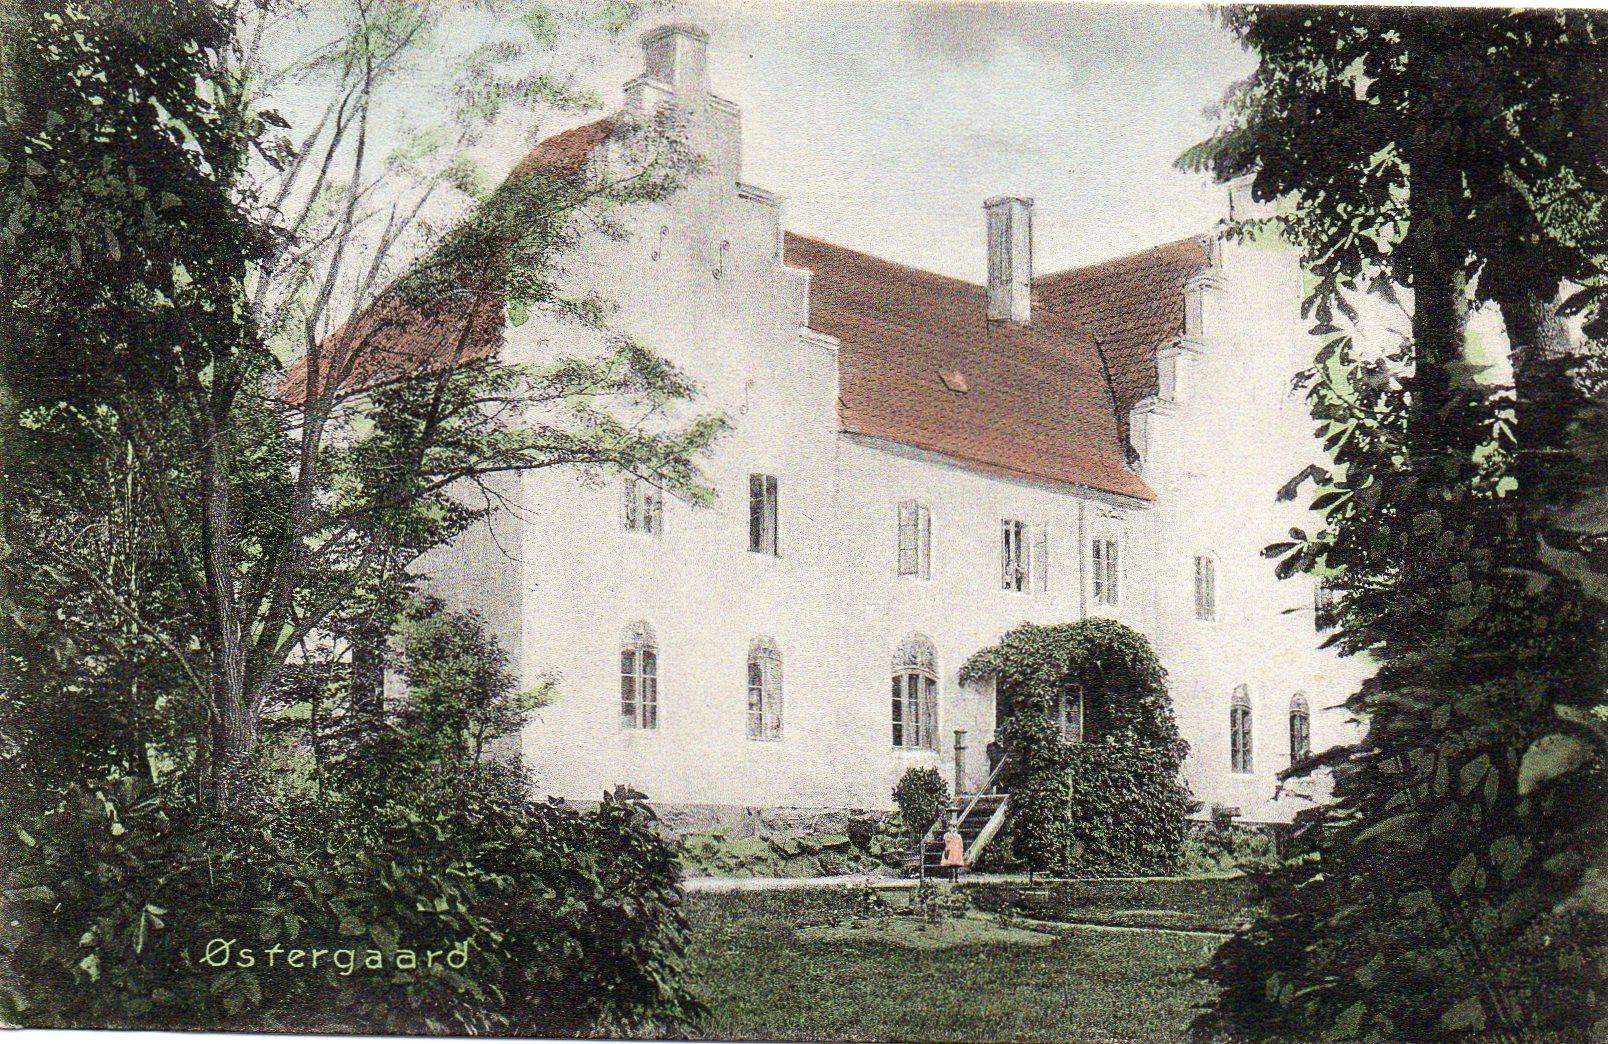 Østergaard (Salling)